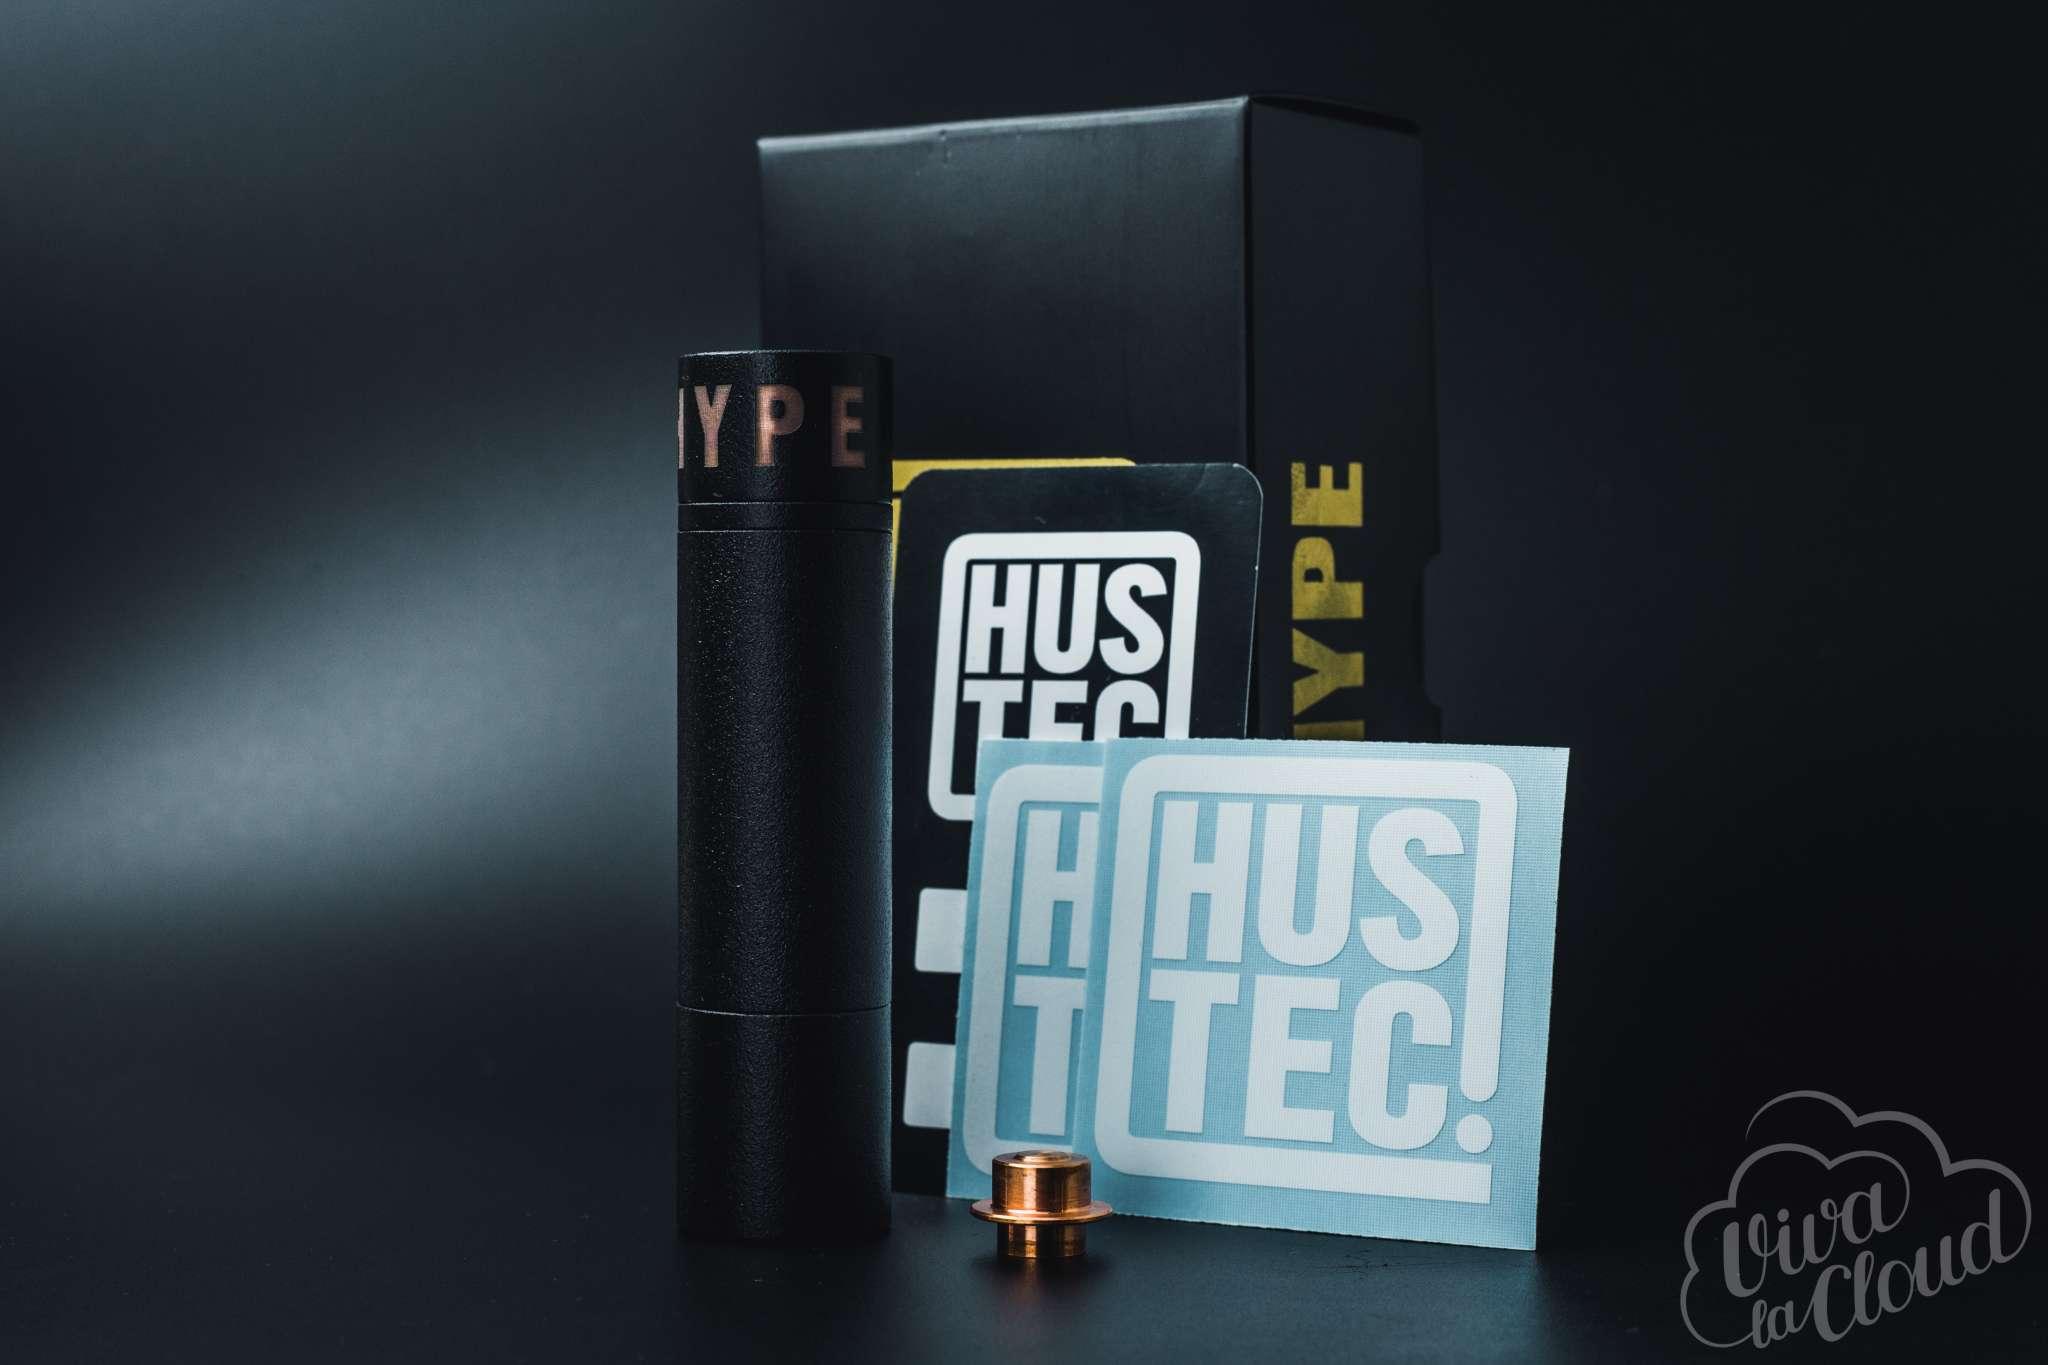 HUSTEC HYPE